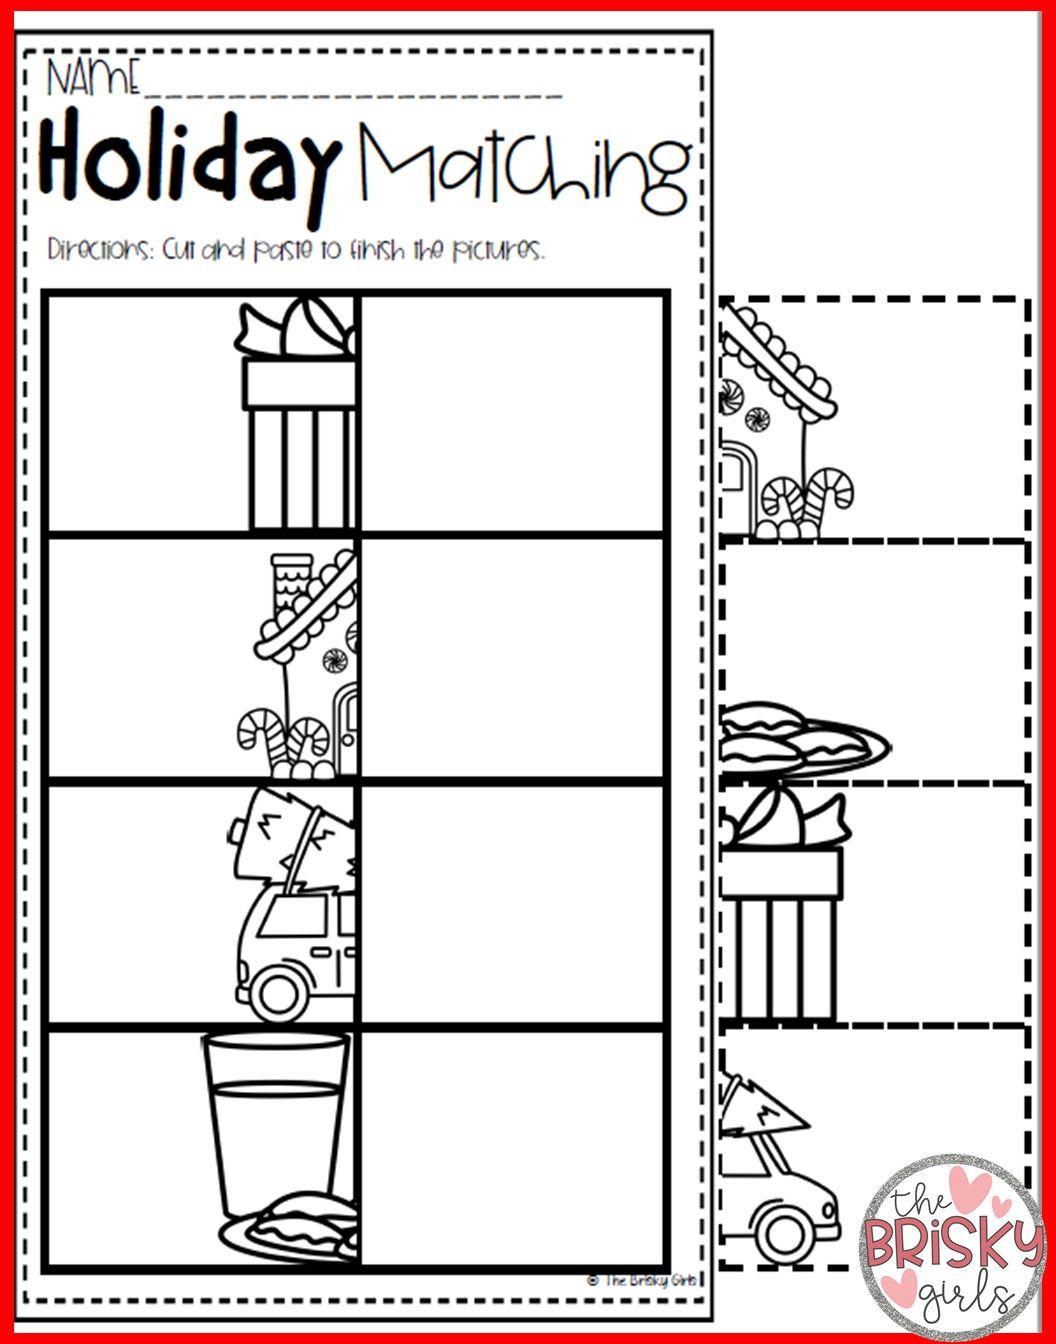 Christmas Activities For Kids Christmas Activities Preschool Chr Preschool Christmas Activities Kindergarten Christmas Activities Holiday Activities For Kids [ 1344 x 1056 Pixel ]